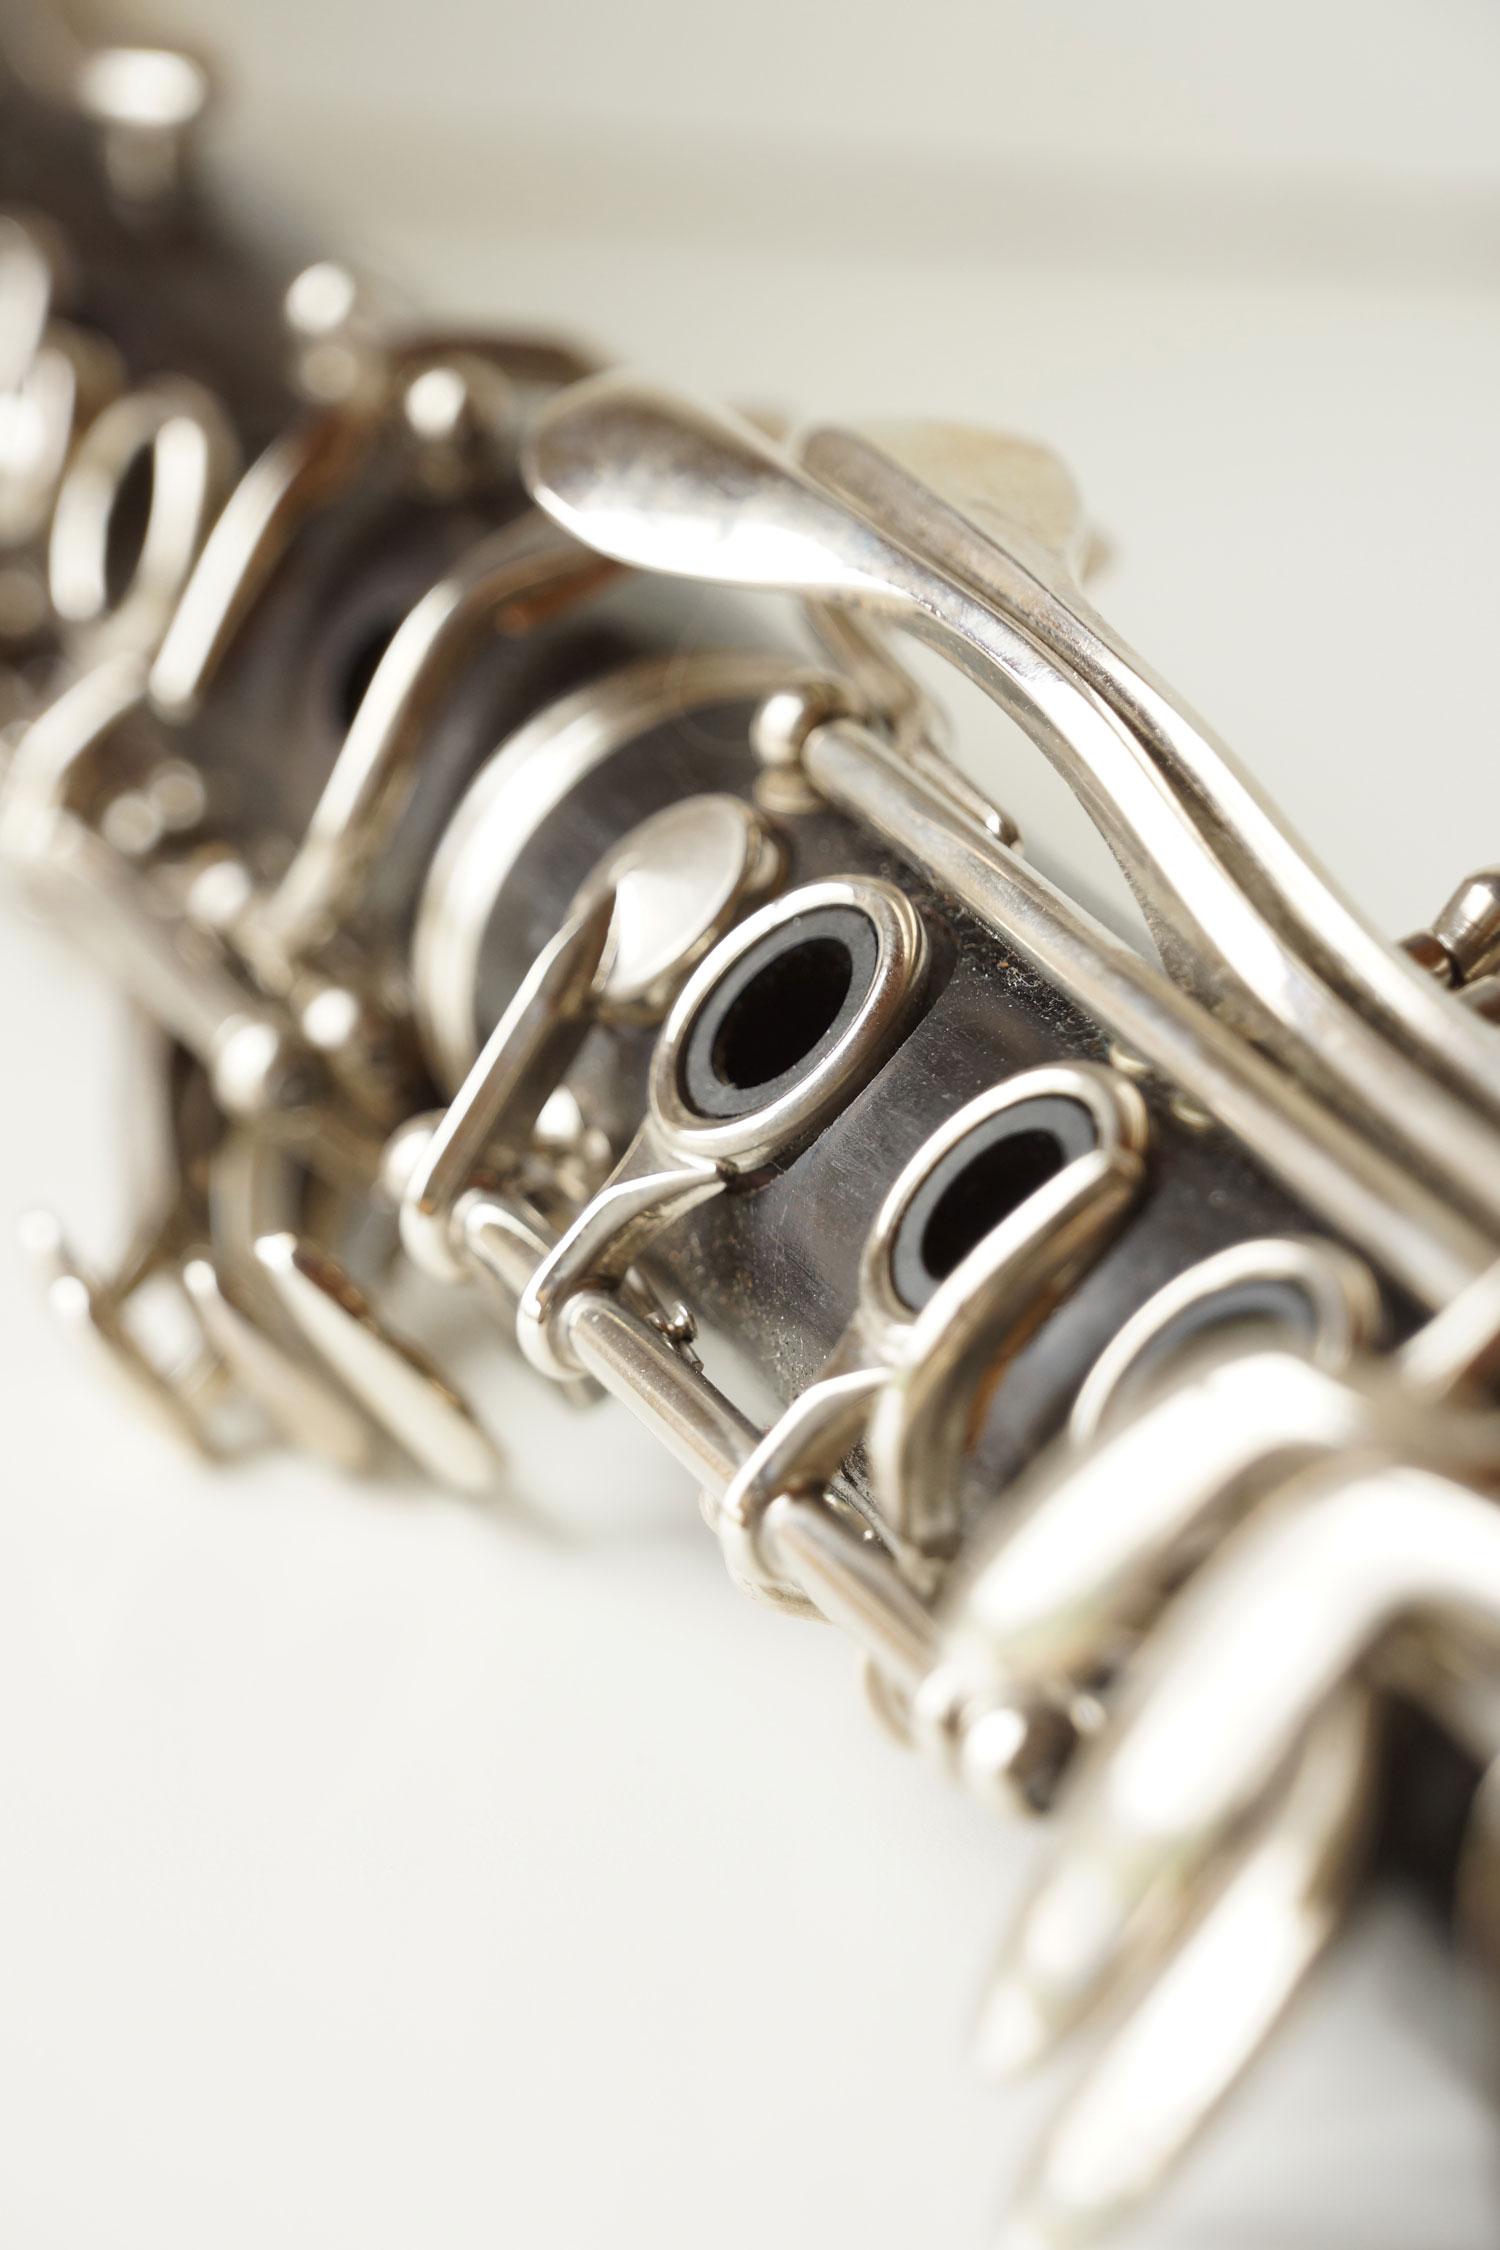 clarinet-blurry-diagonal-OP.jpg